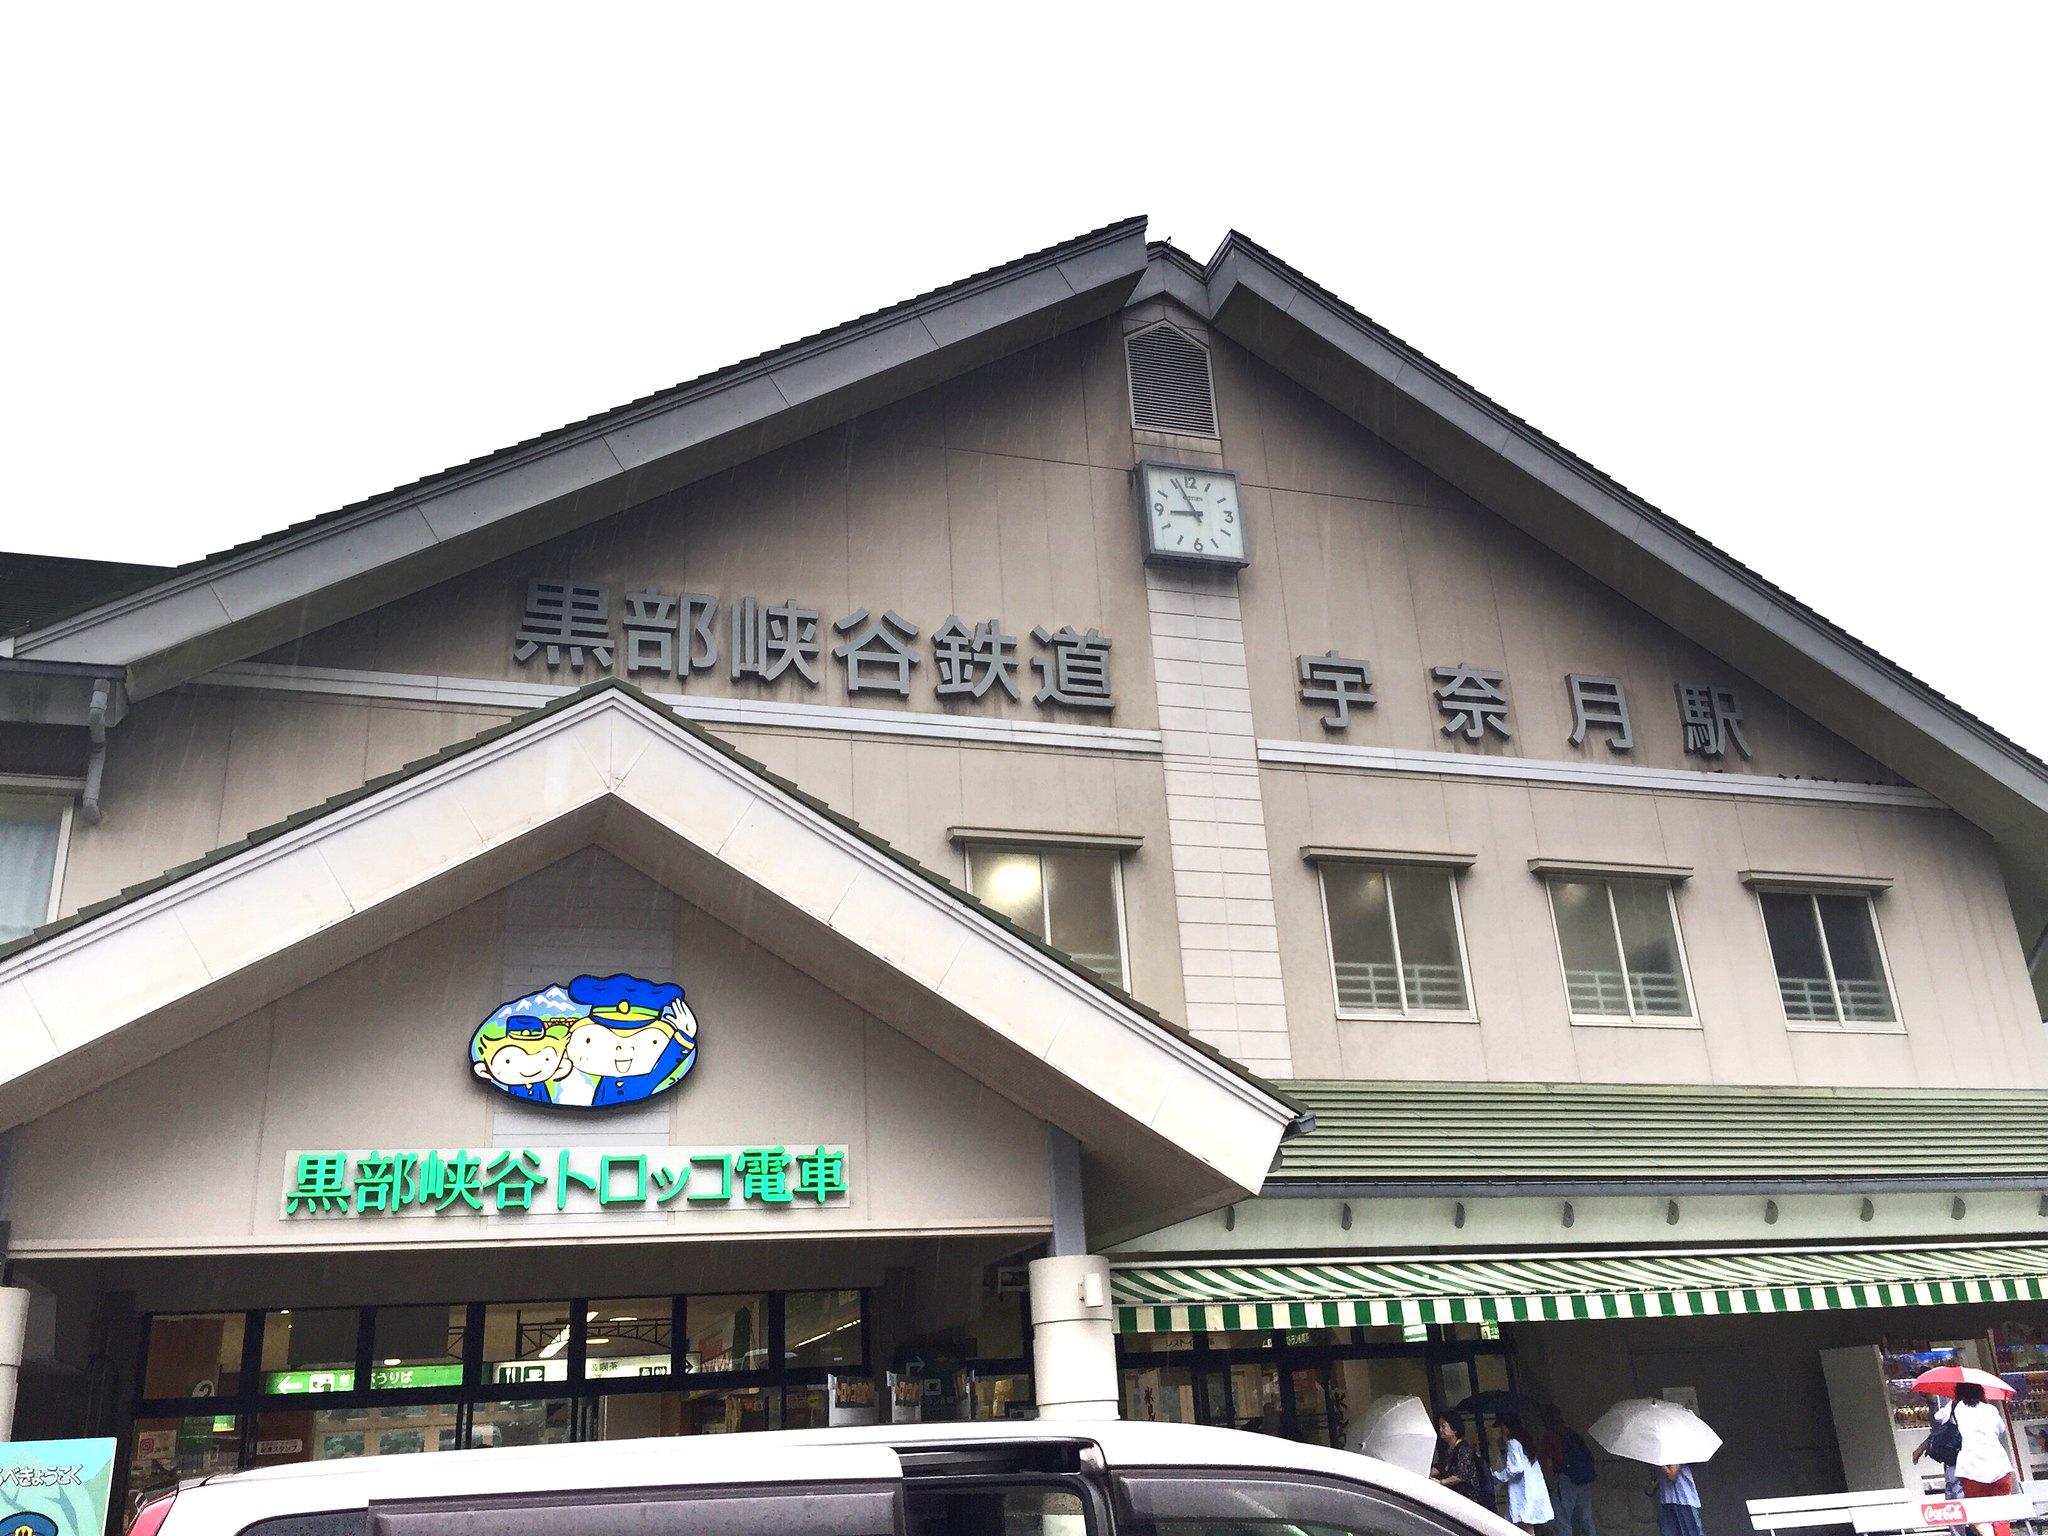 Unazuki Station.